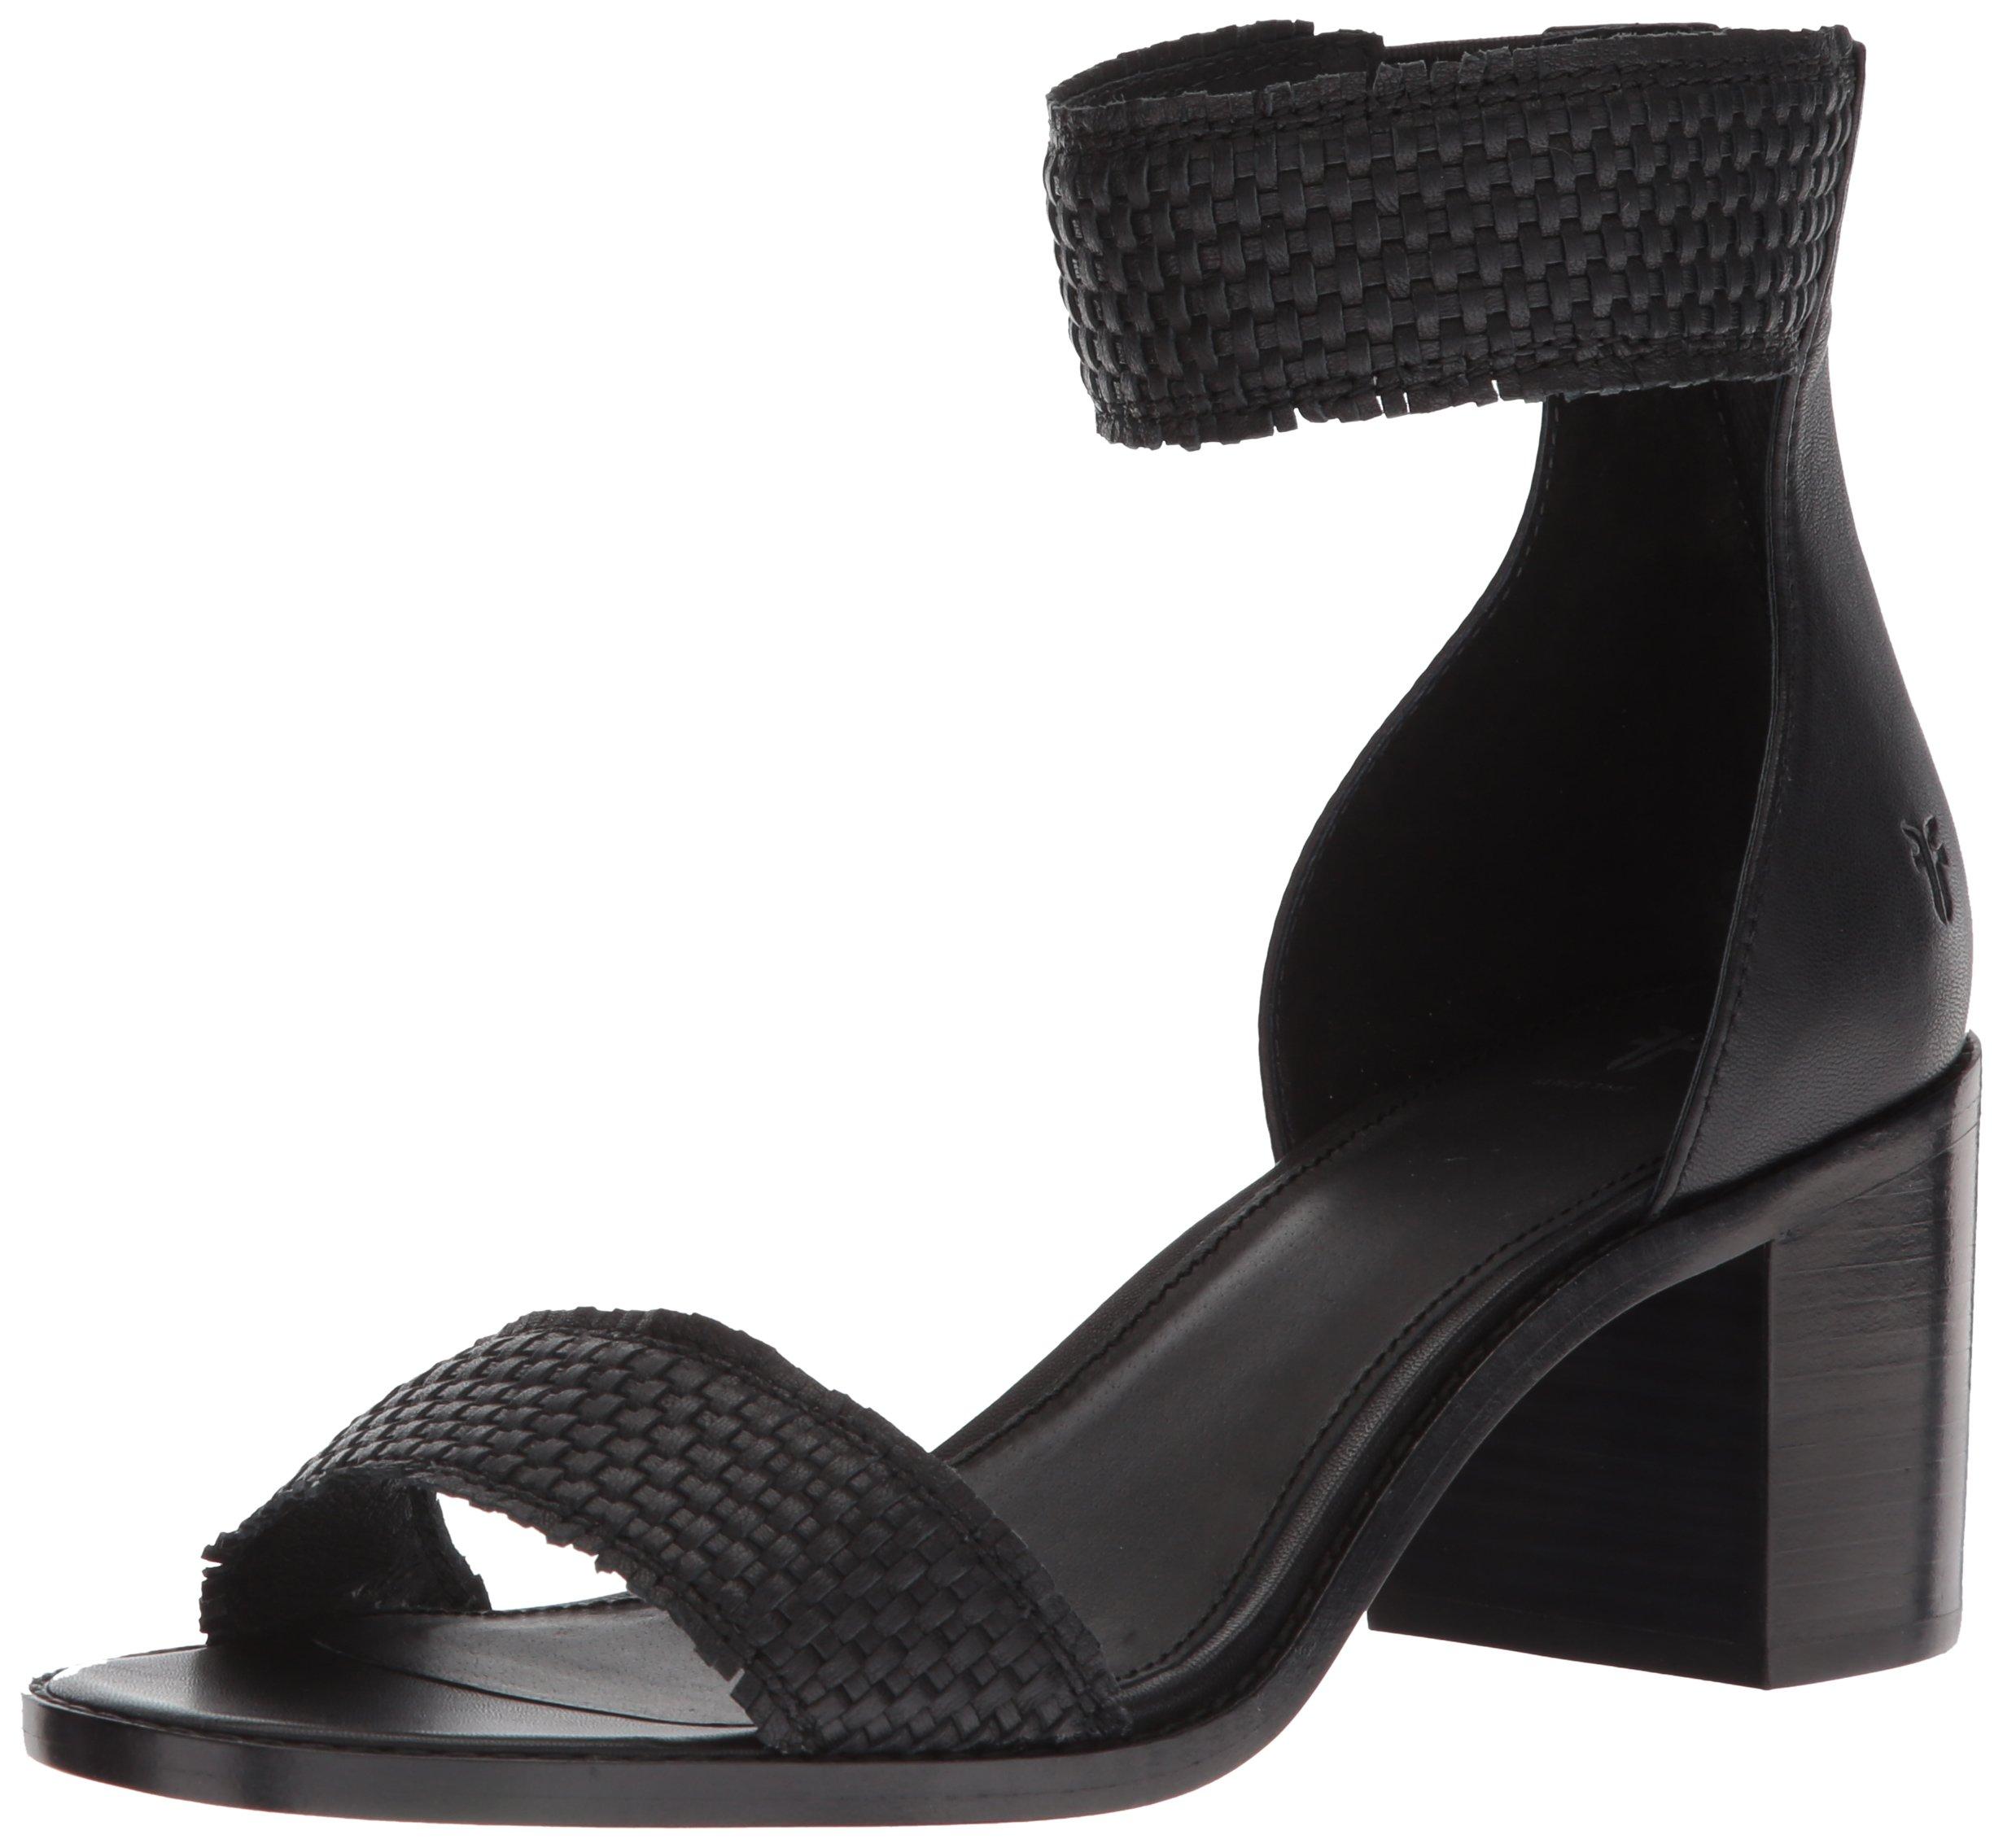 FRYE Women's Bianca Woven Back Zip Heeled Sandal, Black, 7.5 M US